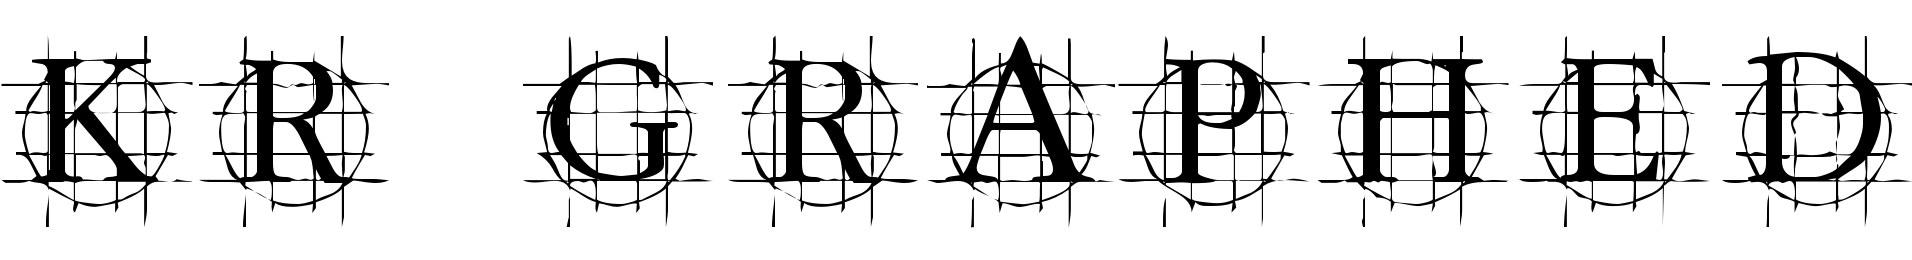 KR Graphed